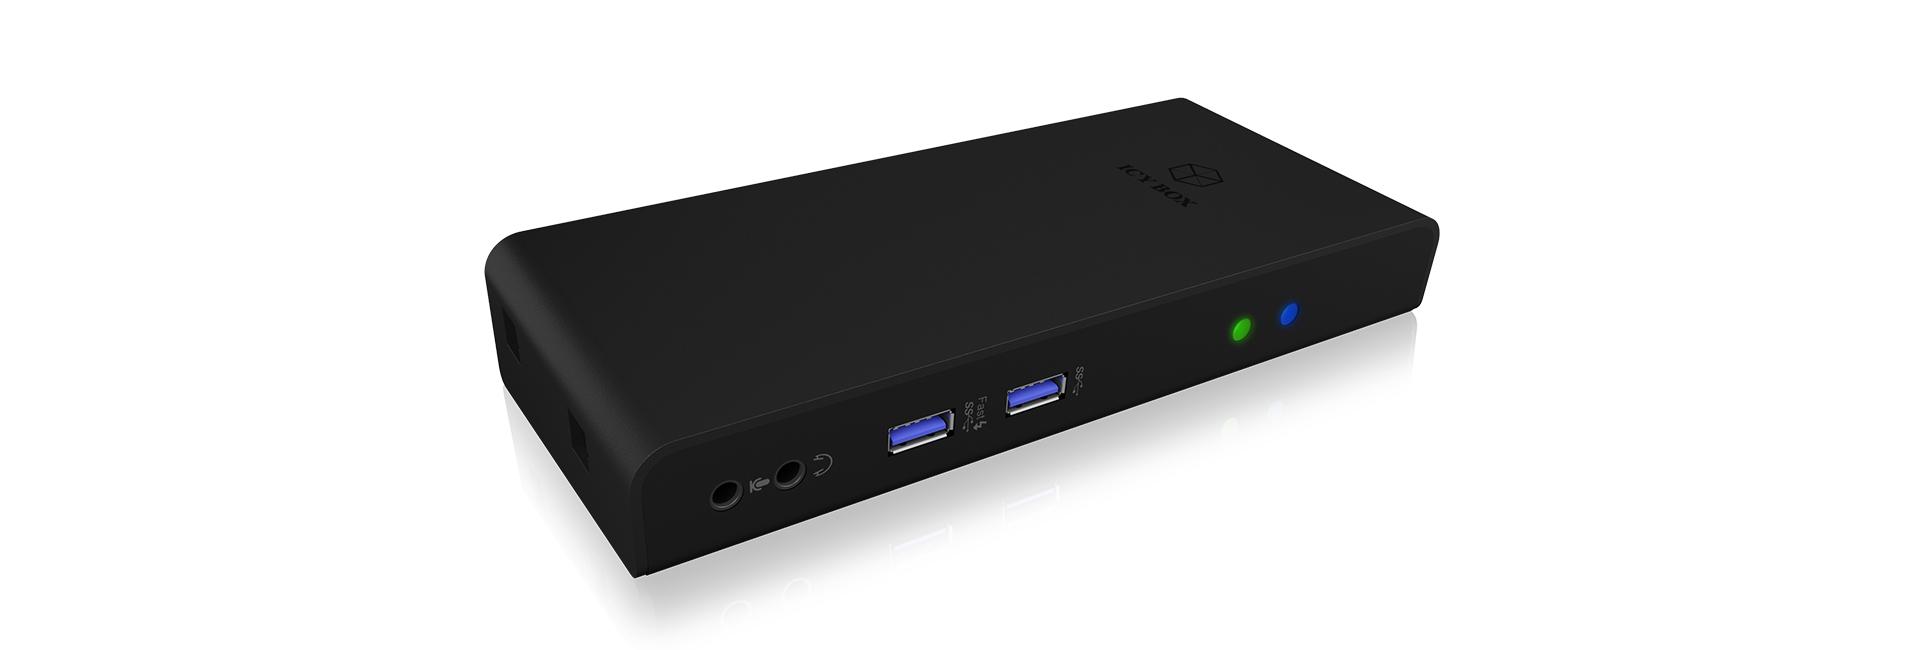 ICY BOX IB-DK2251AC - Verkabelt - 3,5 mm - 10,100,1000 Mbit/s - Schwarz - 5 Gbit/s - Full HD